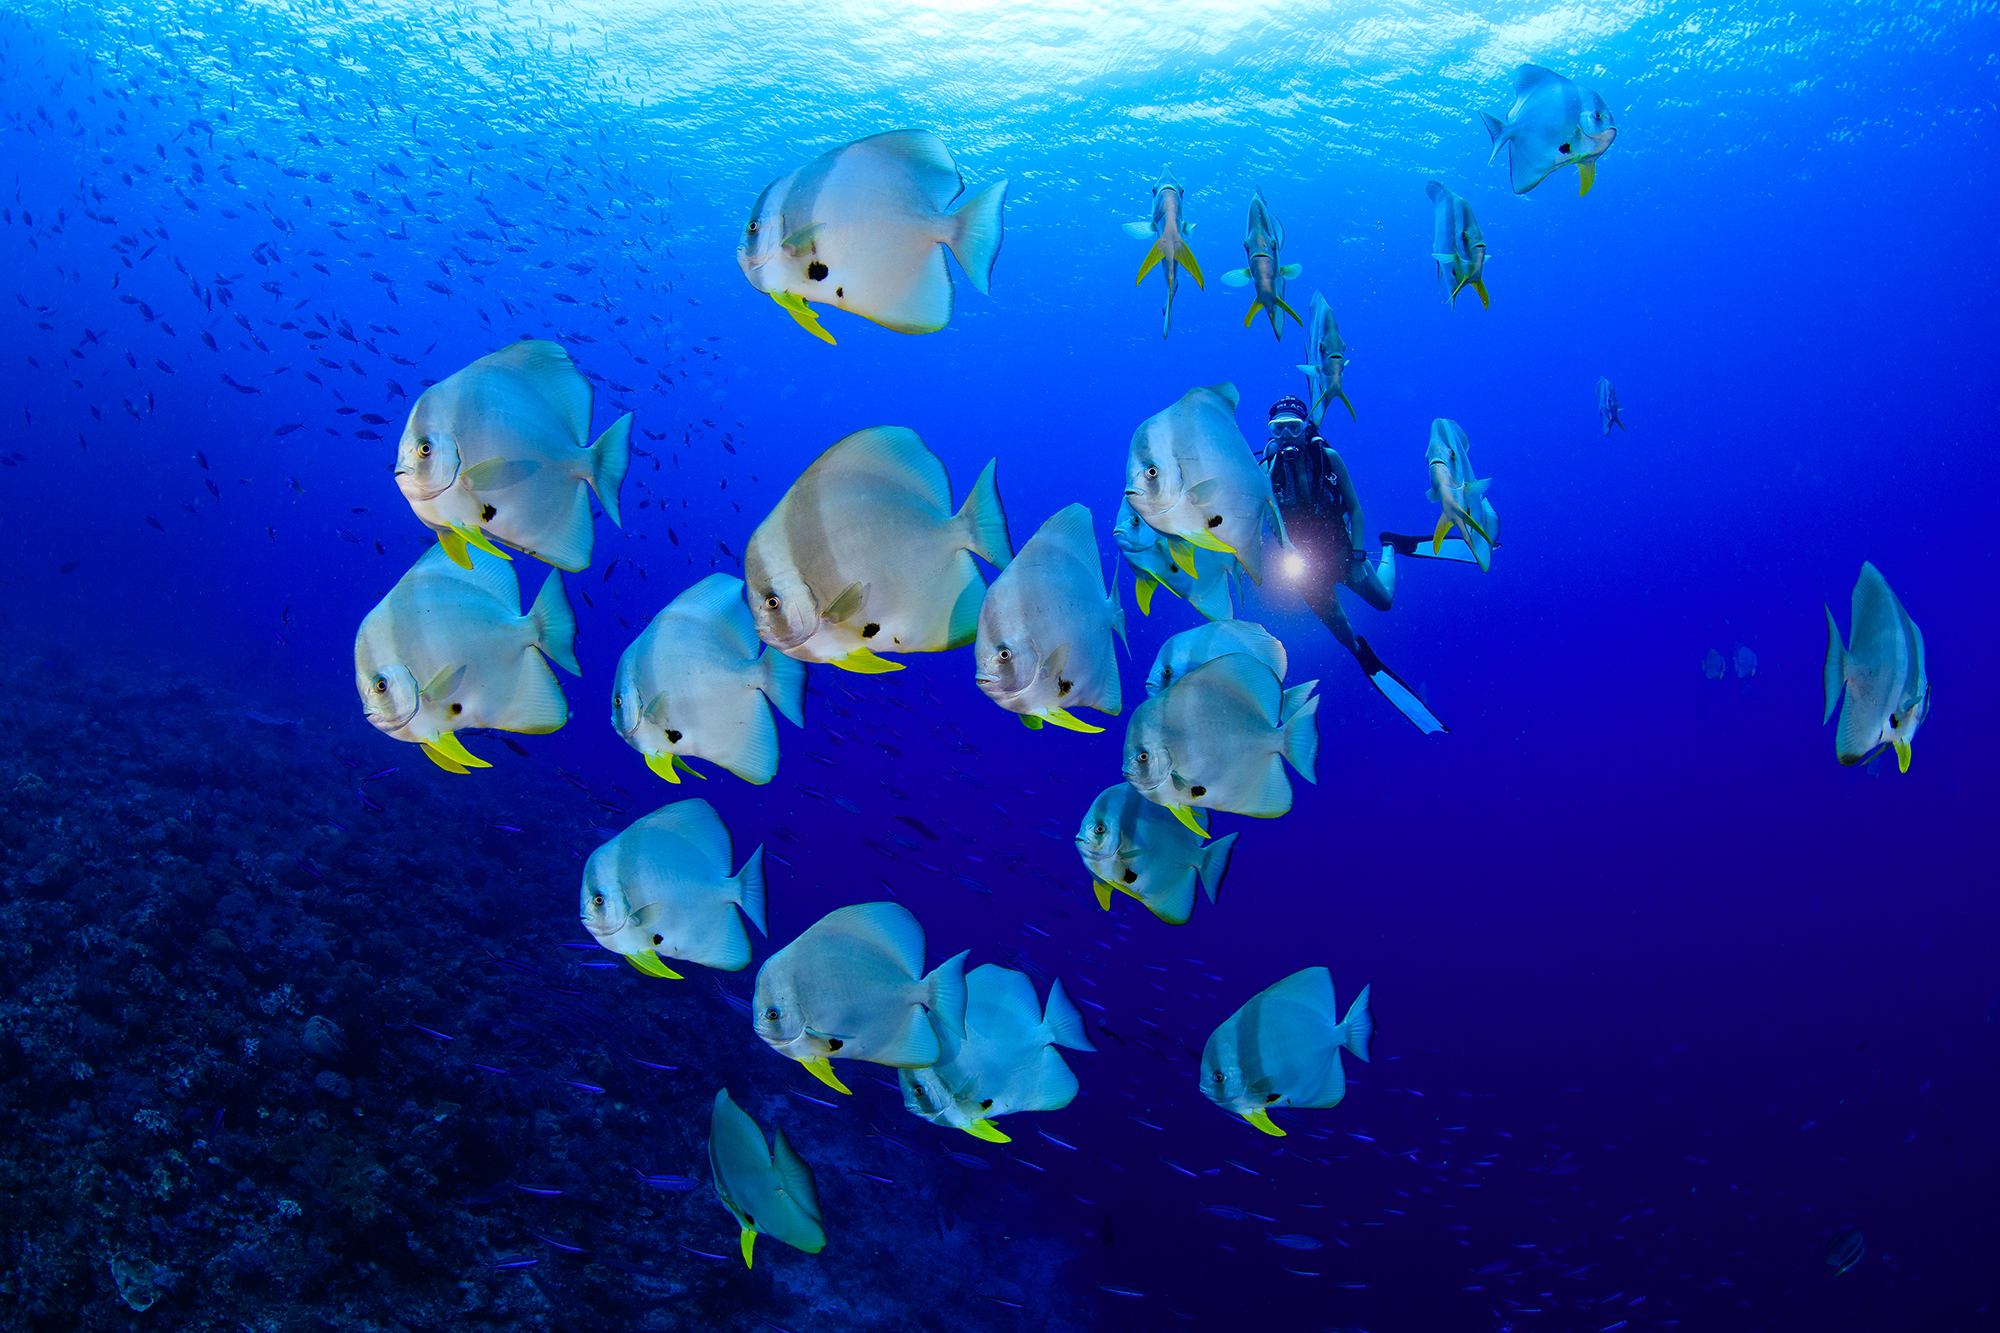 batfish in RAJA AMPAT, INDONESIA CREDIT: YEN-YI LEE / CORAL REEF IMAGE BANK